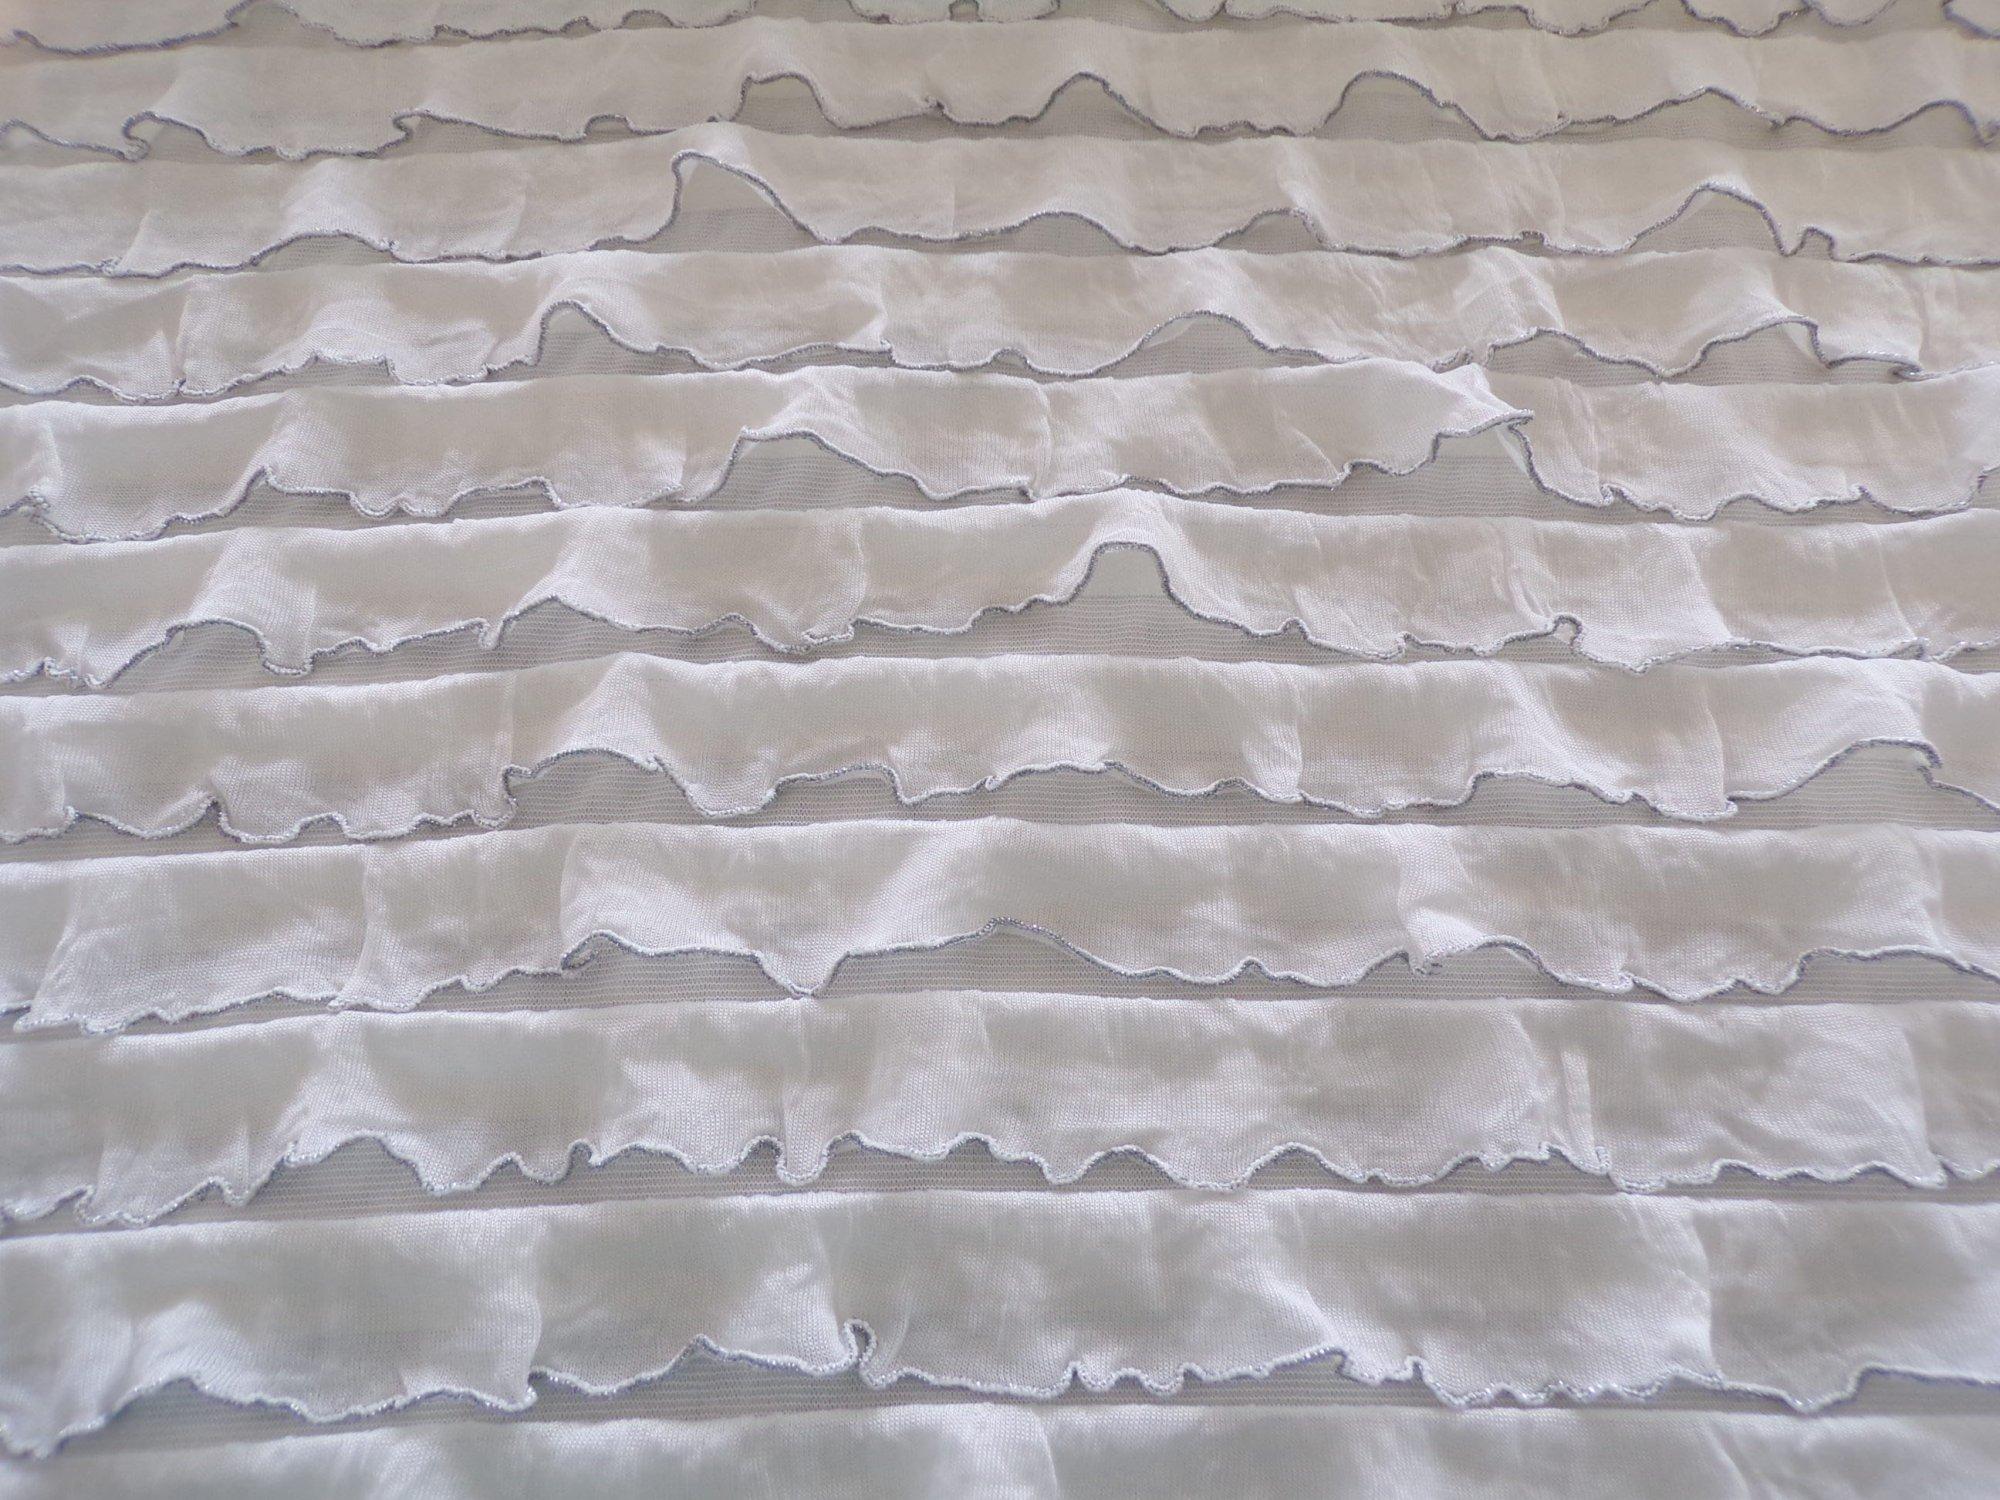 Polyester Nylon Ruffles - White with Silver